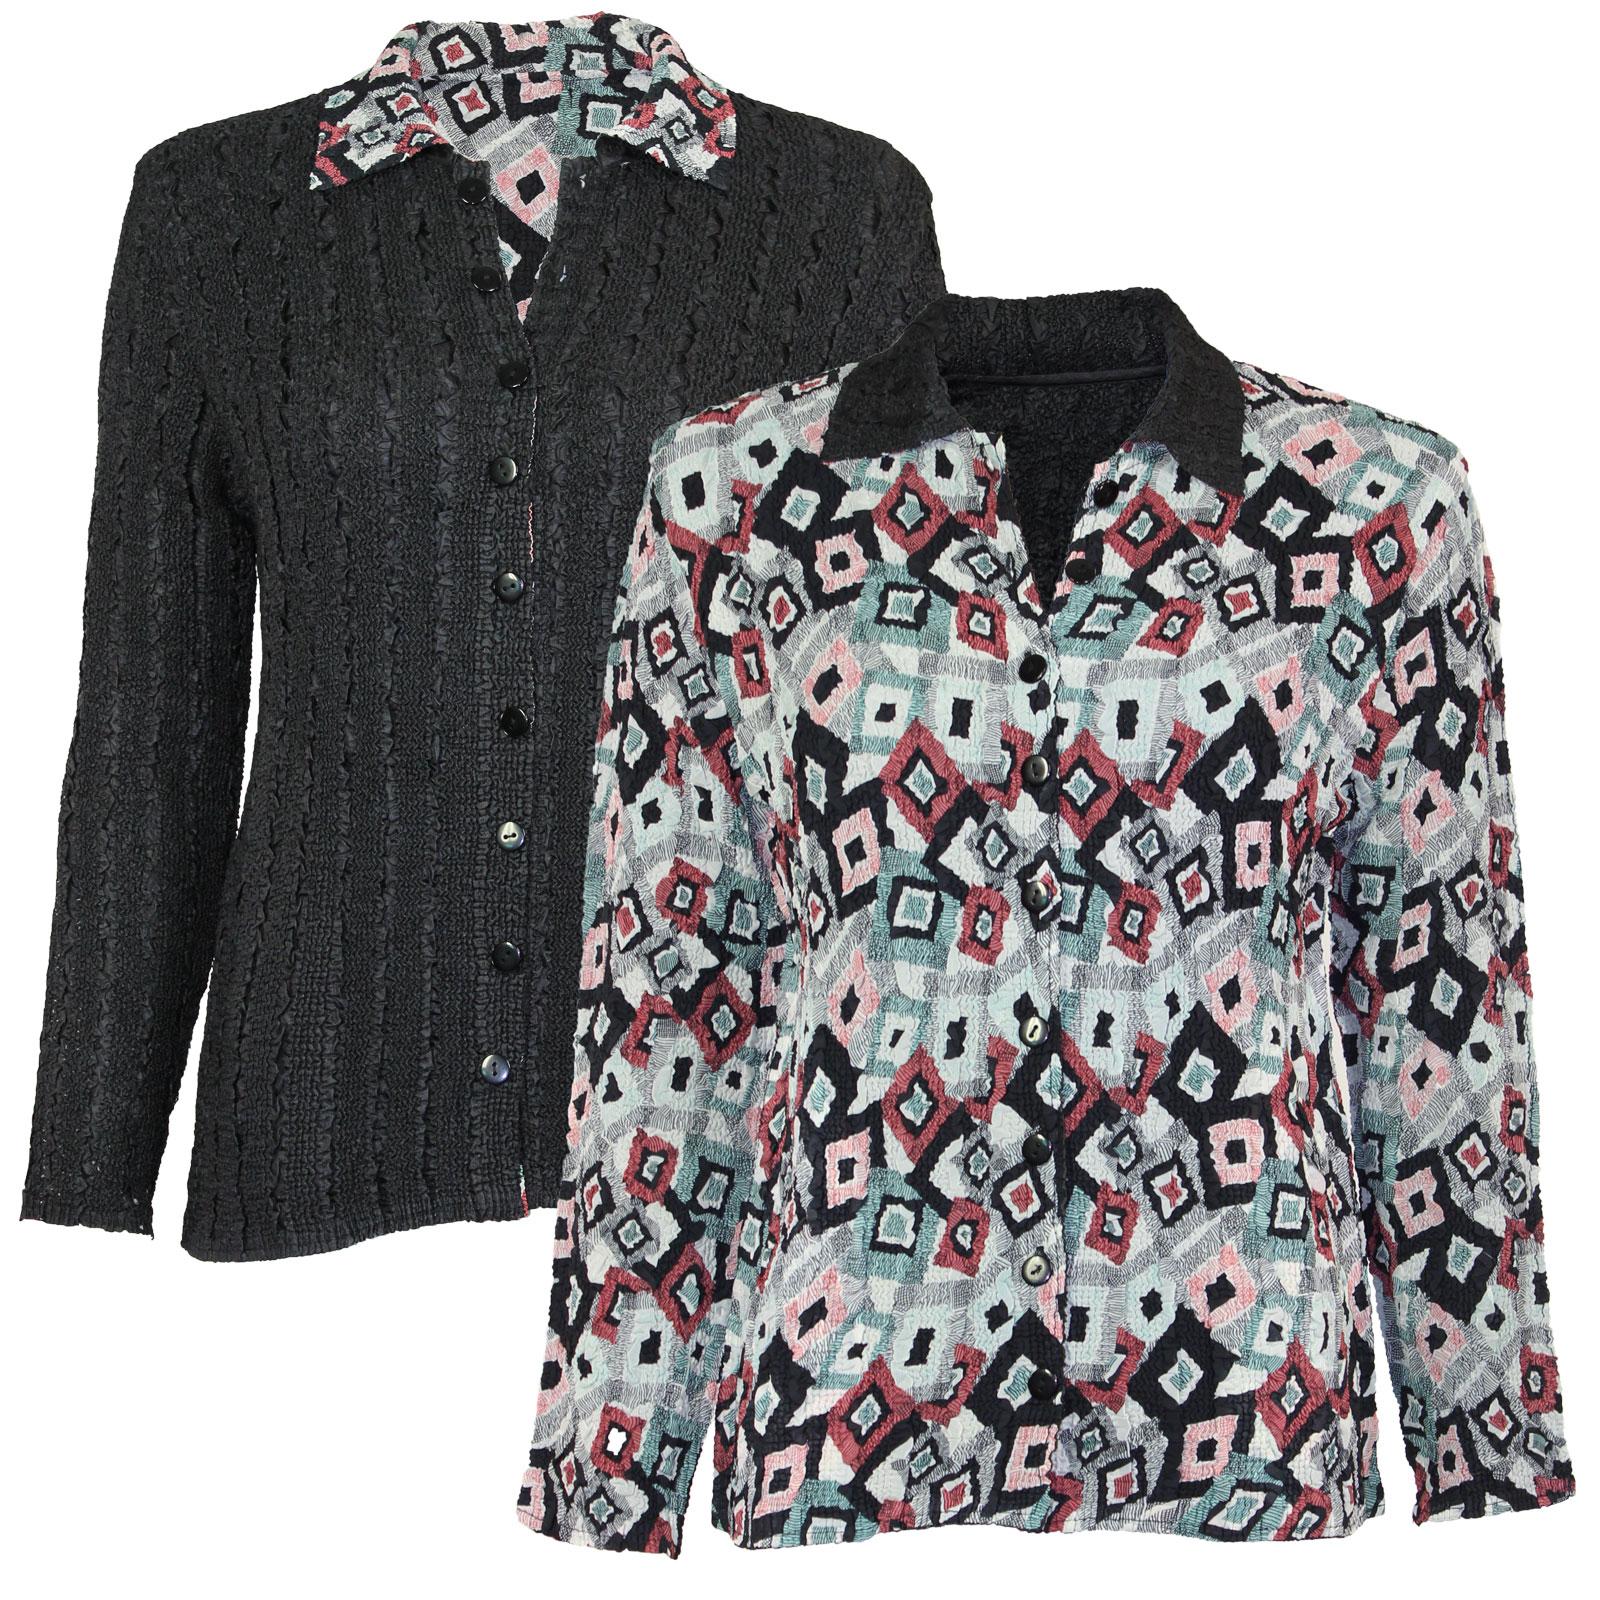 Wholesale Magic Crush - Reversible Jackets #3007 - 1X-2X